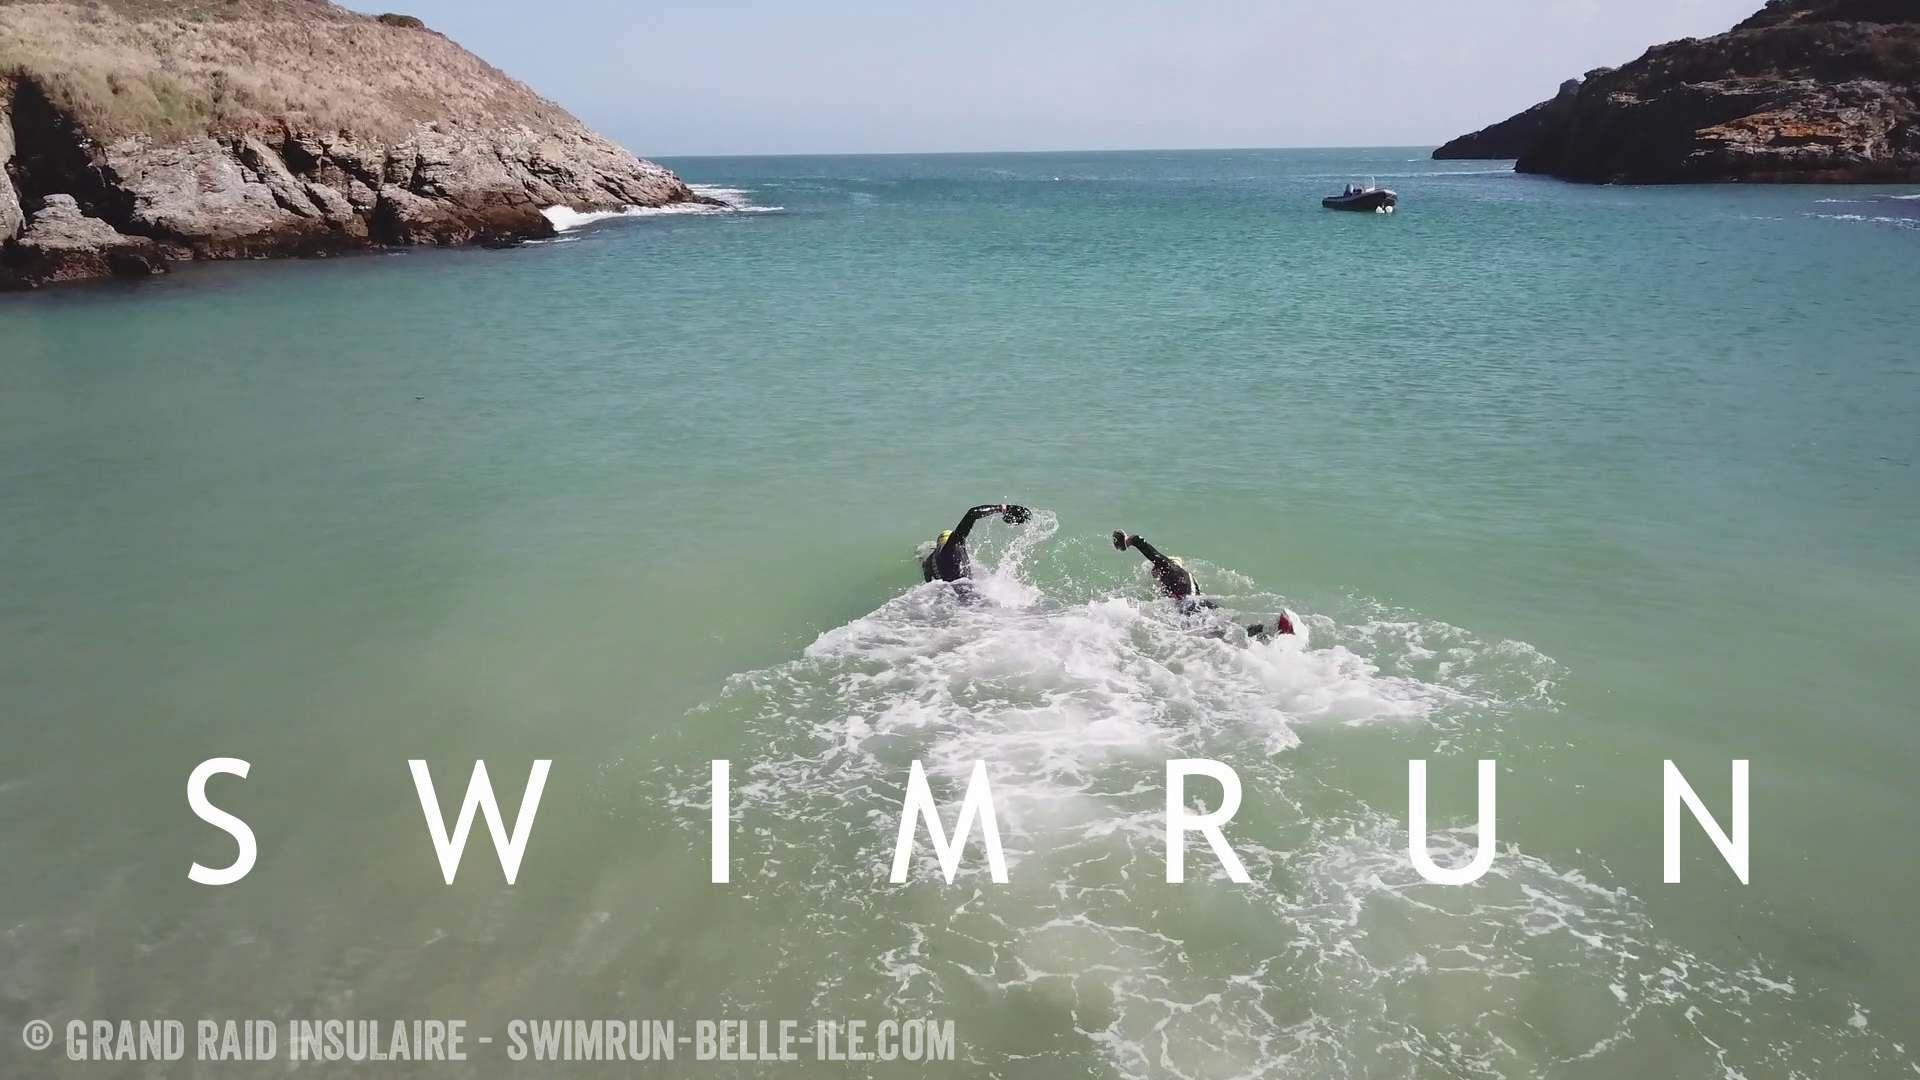 swimrun-hd_teaser_cr_resize_33